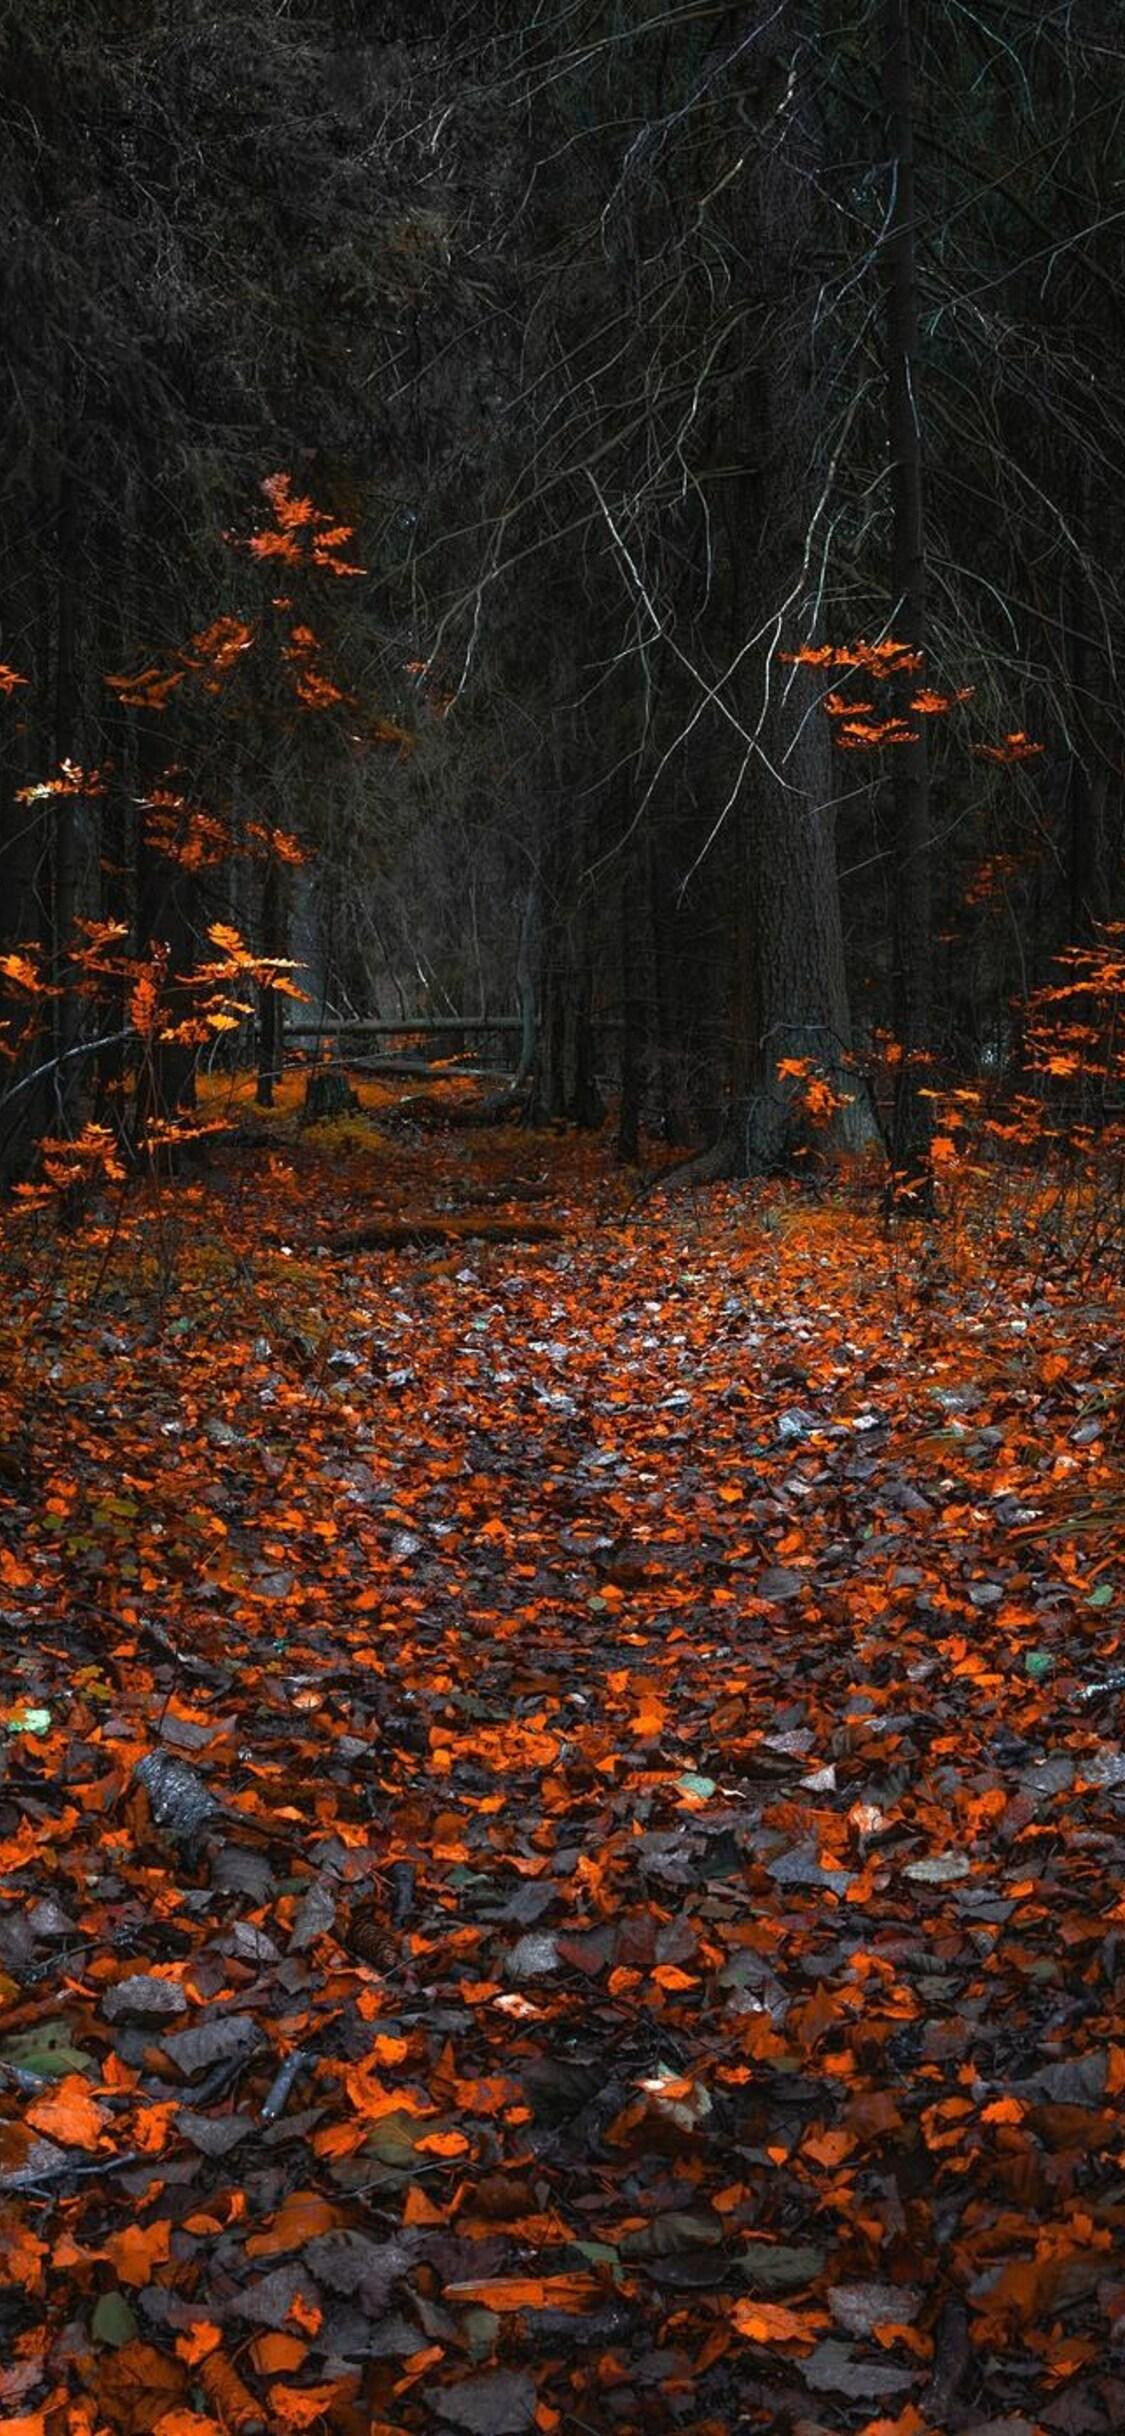 1125x2436 Forest Fall Leaf Iphone Xs Iphone 10 Iphone X Hd